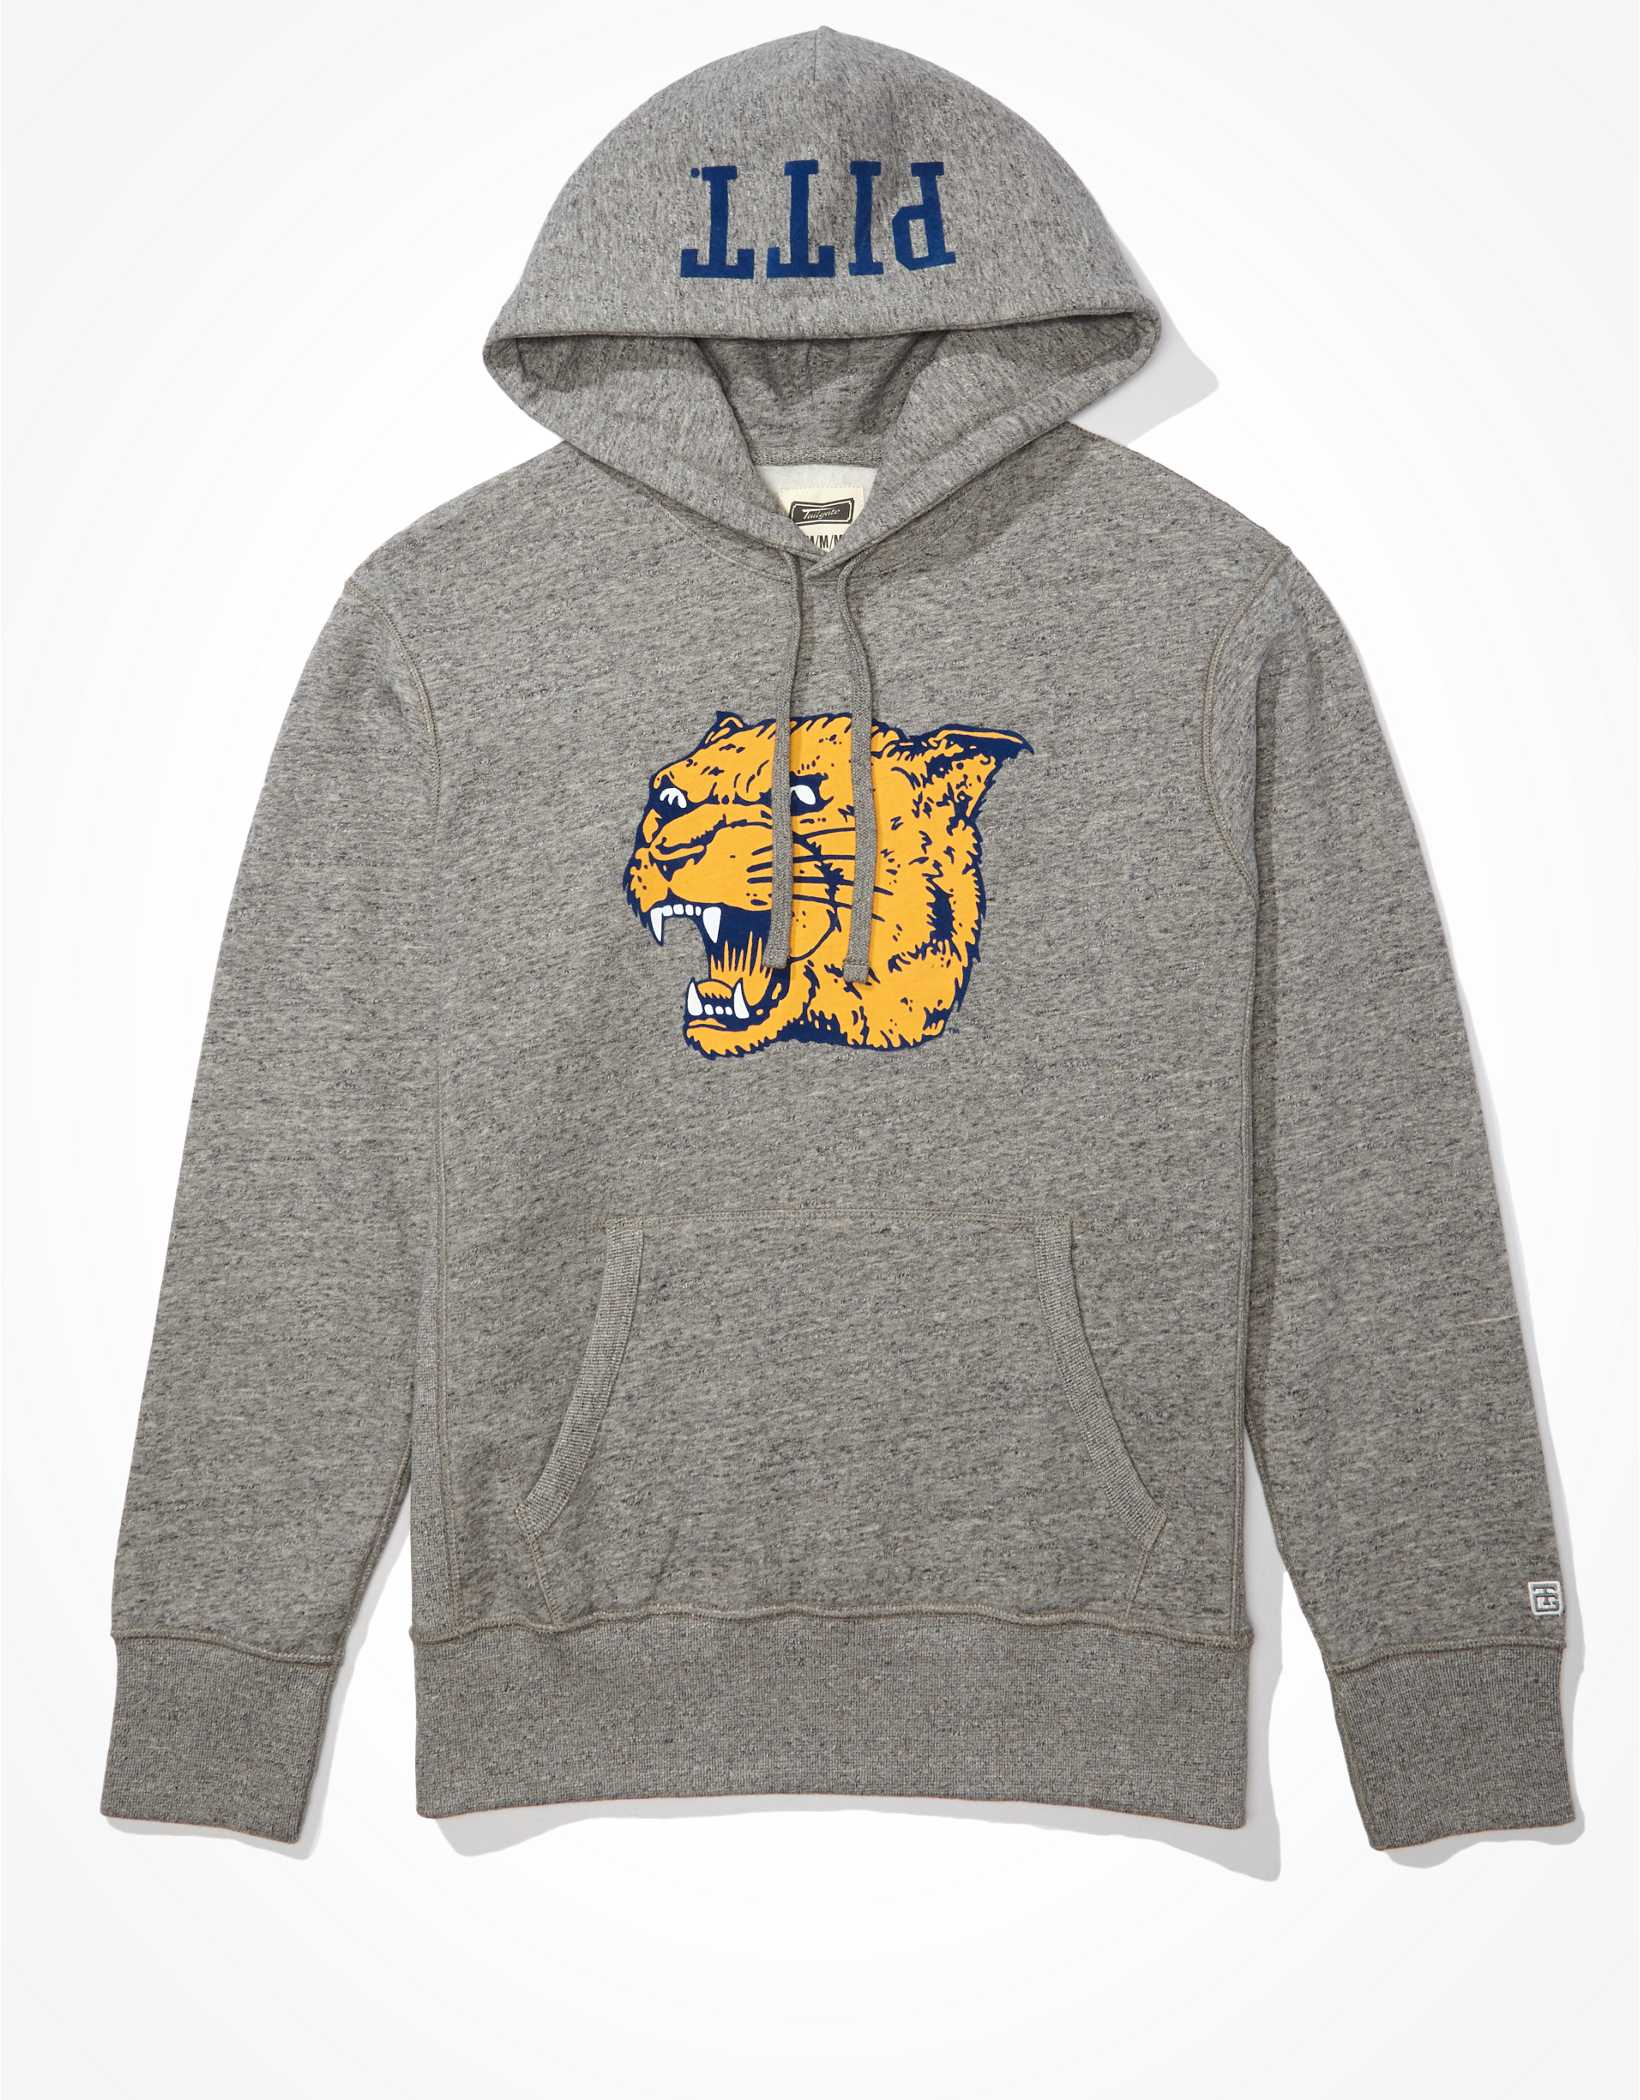 Tailgate Men's Pitt Panthers Fleece Hoodie